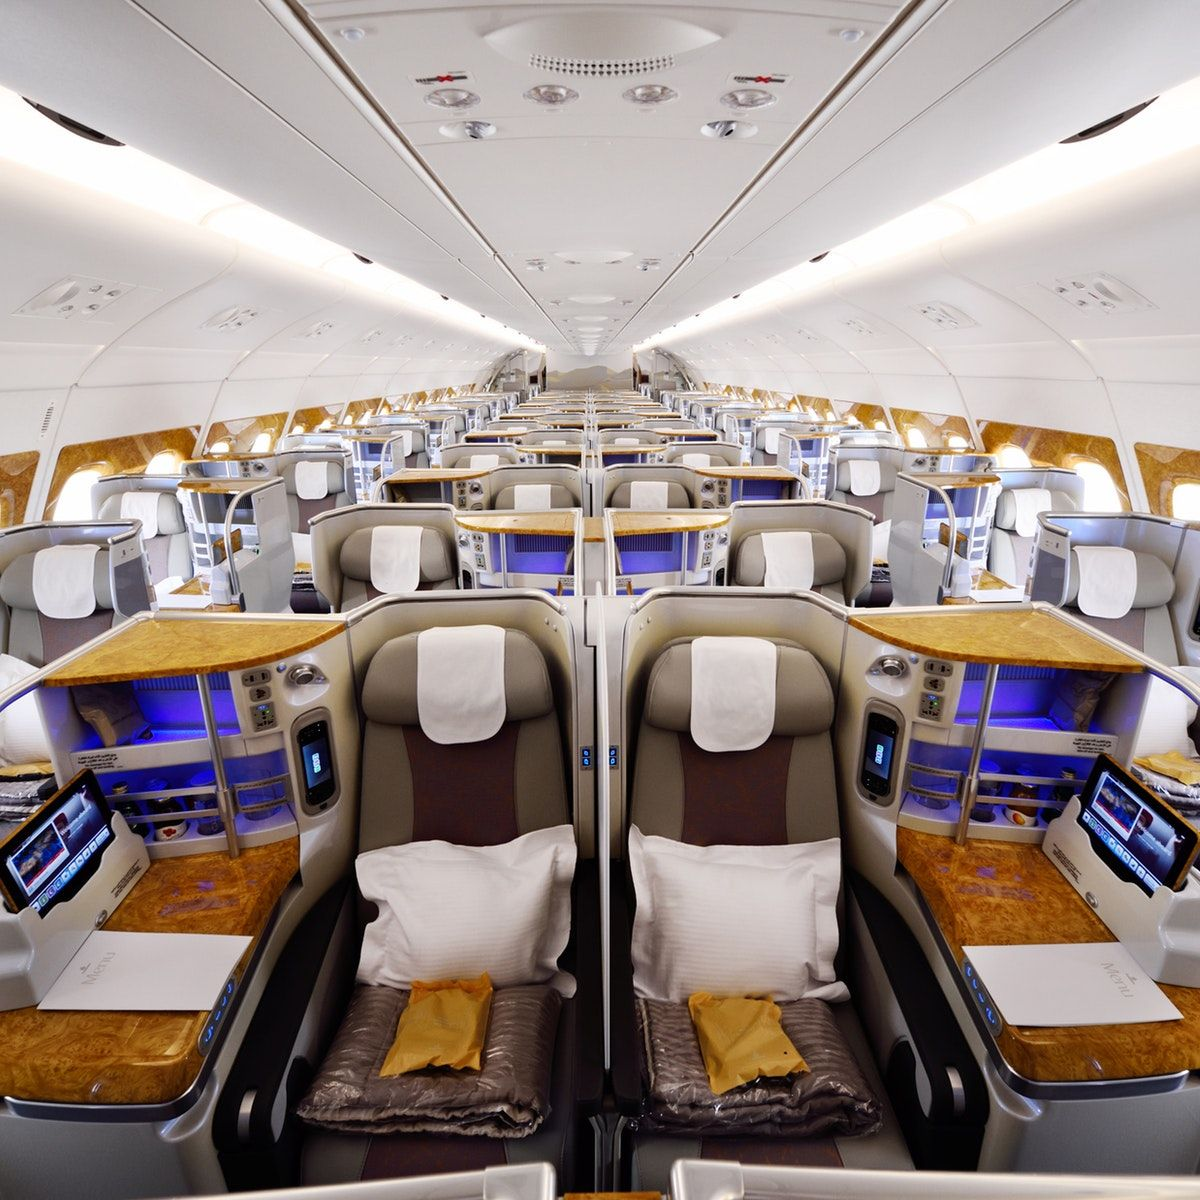 Emirates Unbundles Its Business Class Business class